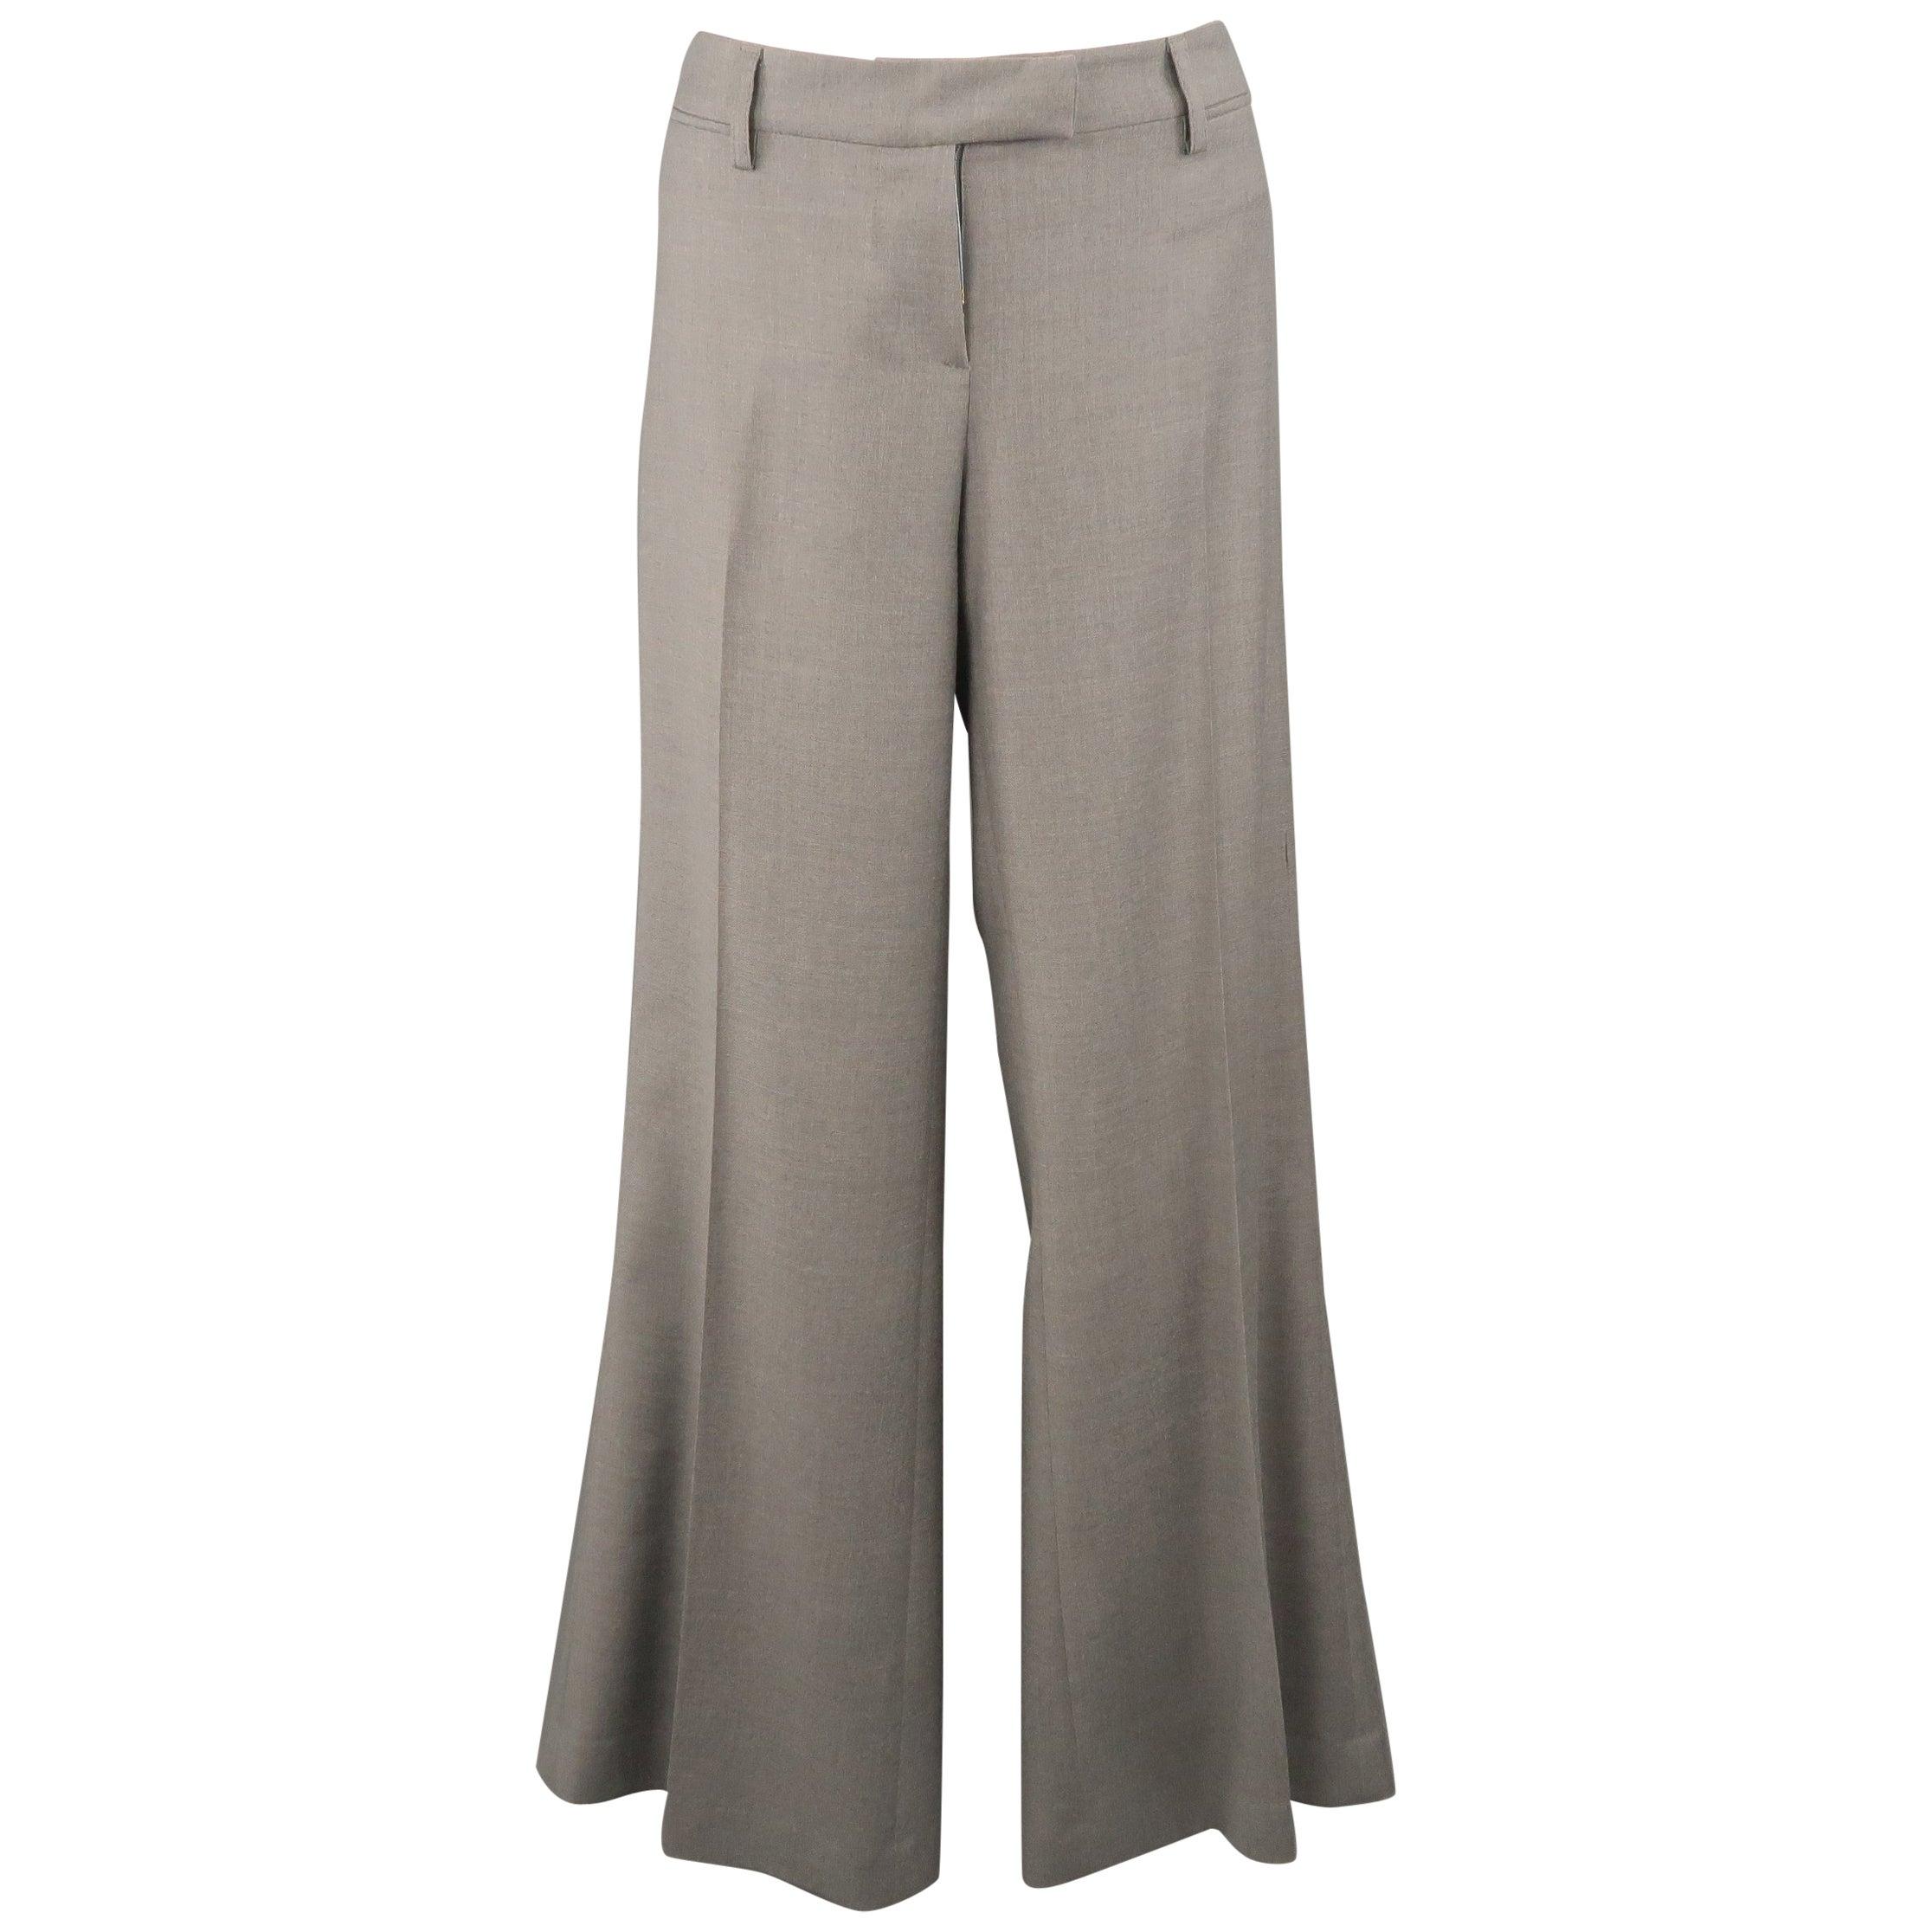 EMILIO PUCCI Size 10 Gray Virgin Wool Wide Leg Dress Pants